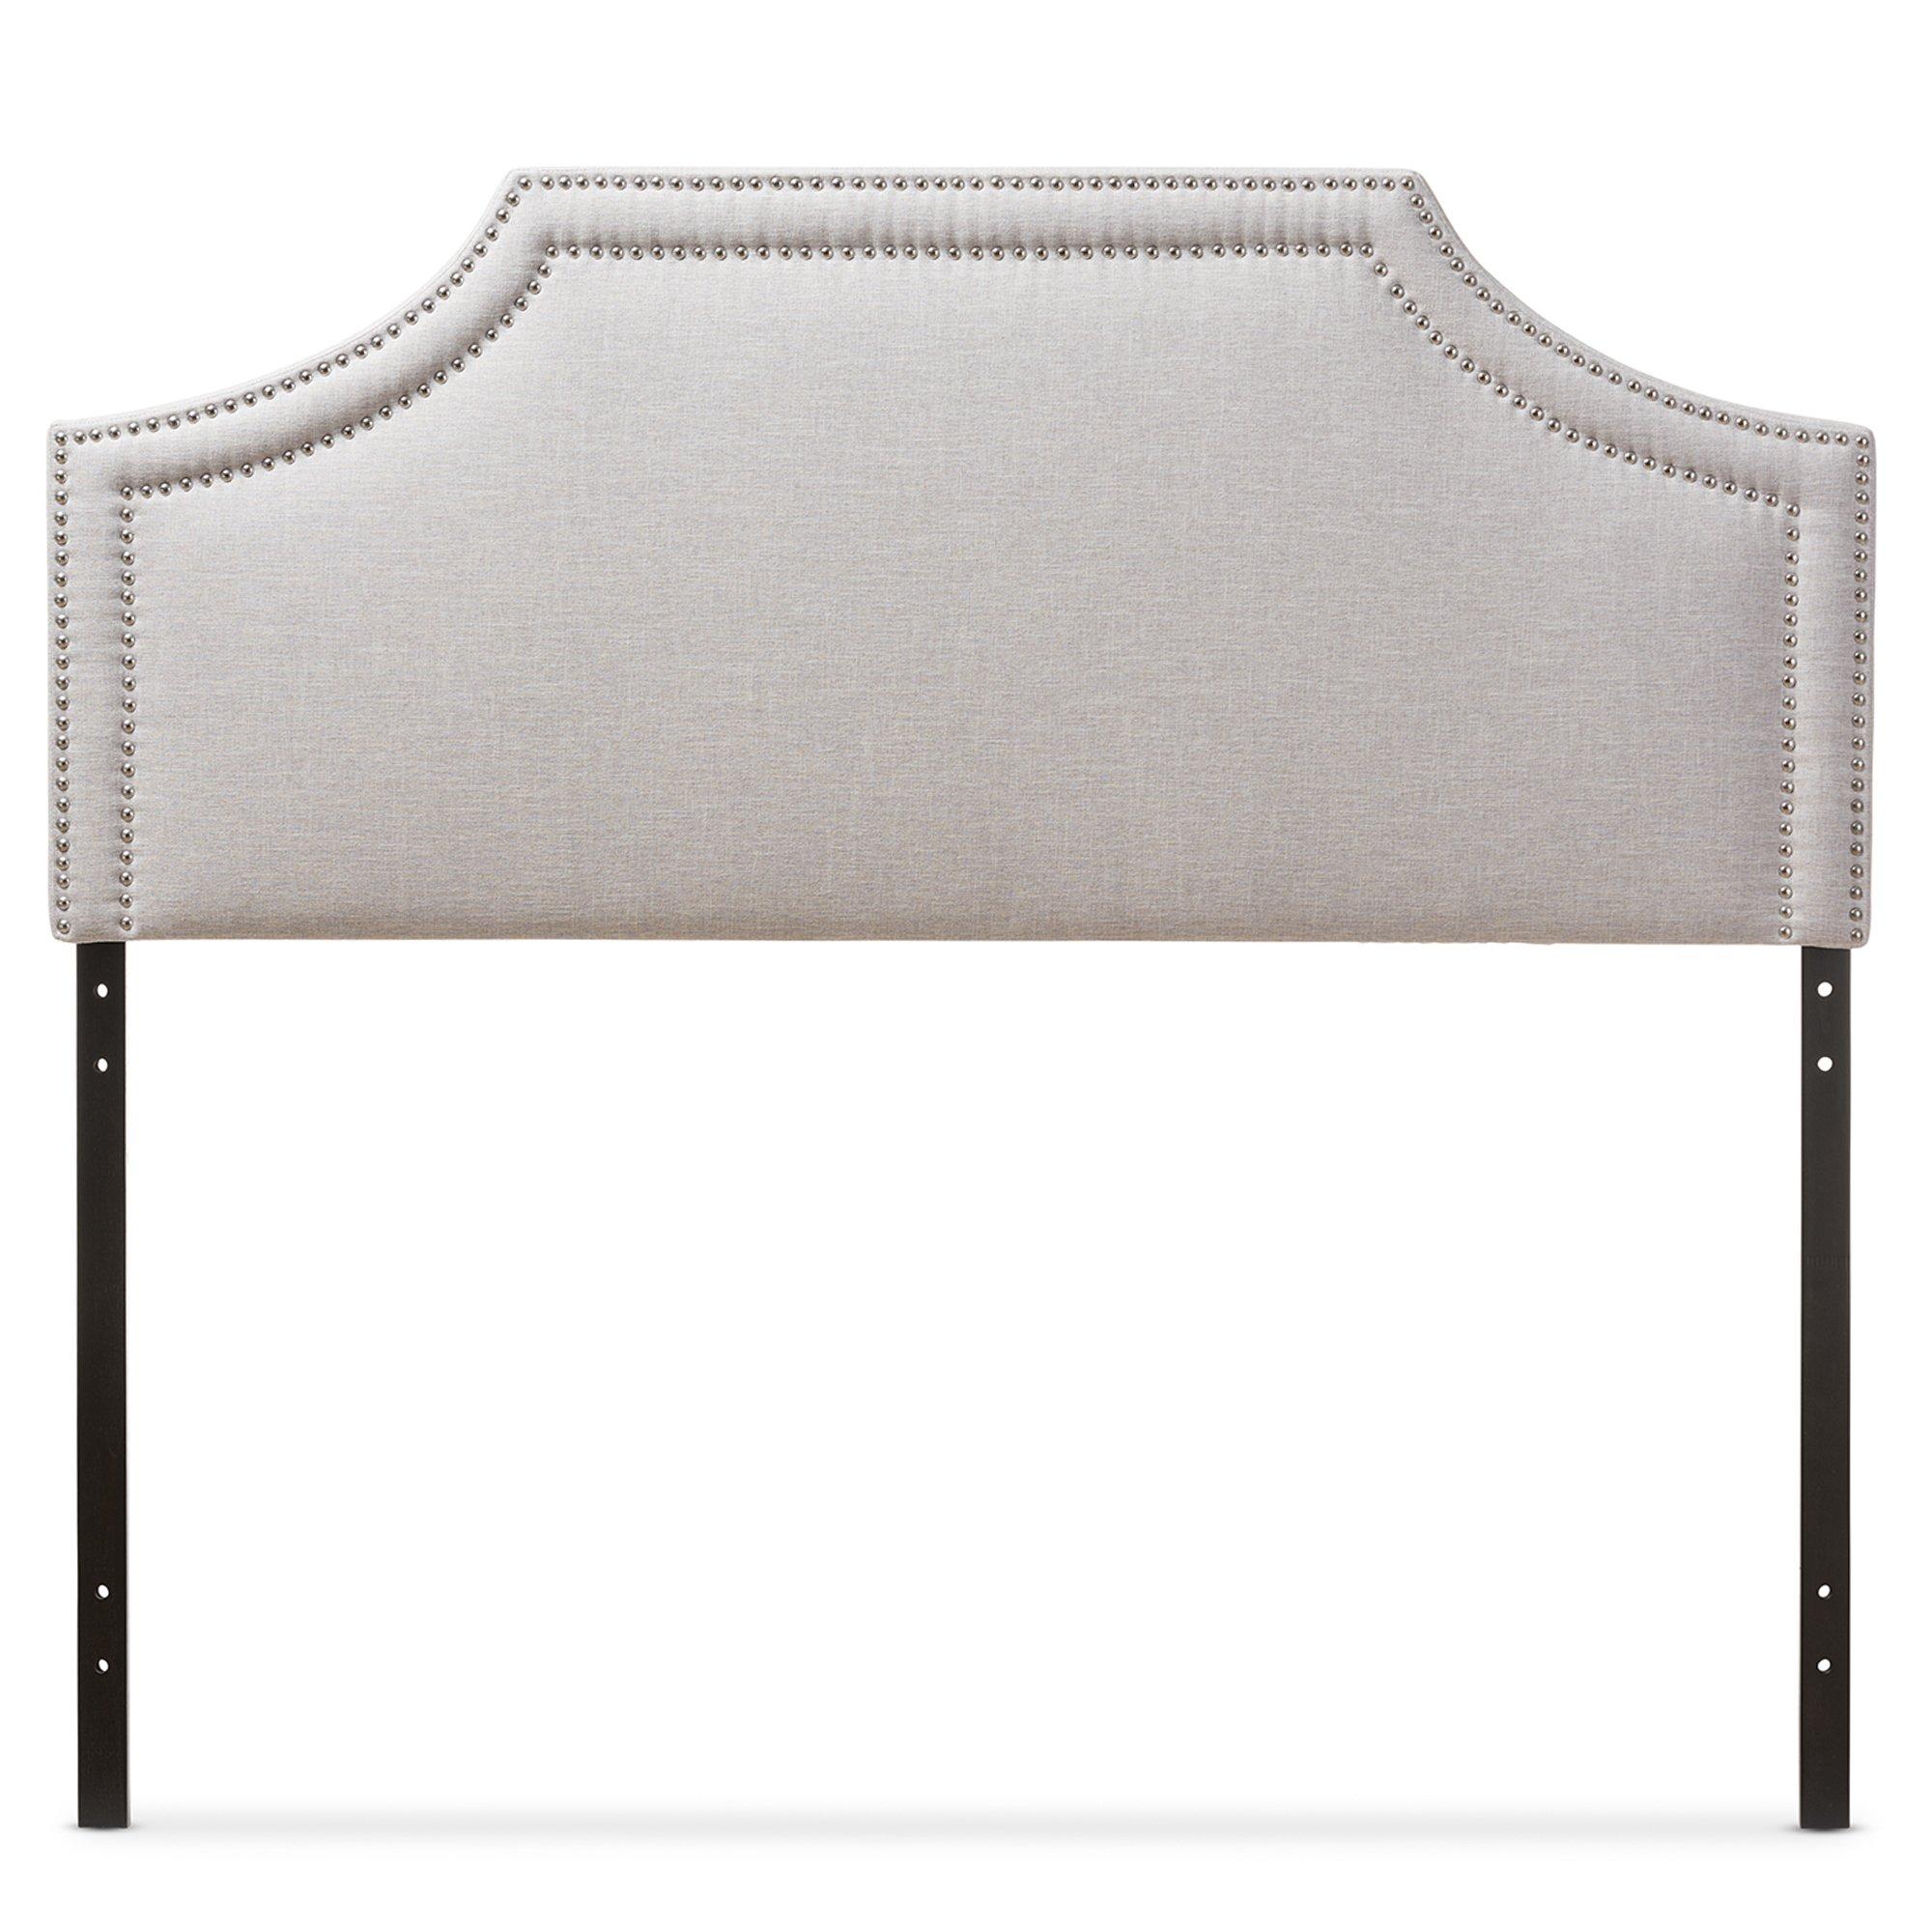 Baxton Studio Guifford Modern & Contemporary Fabric Upholstered Headboard, Queen, Greyish Beige